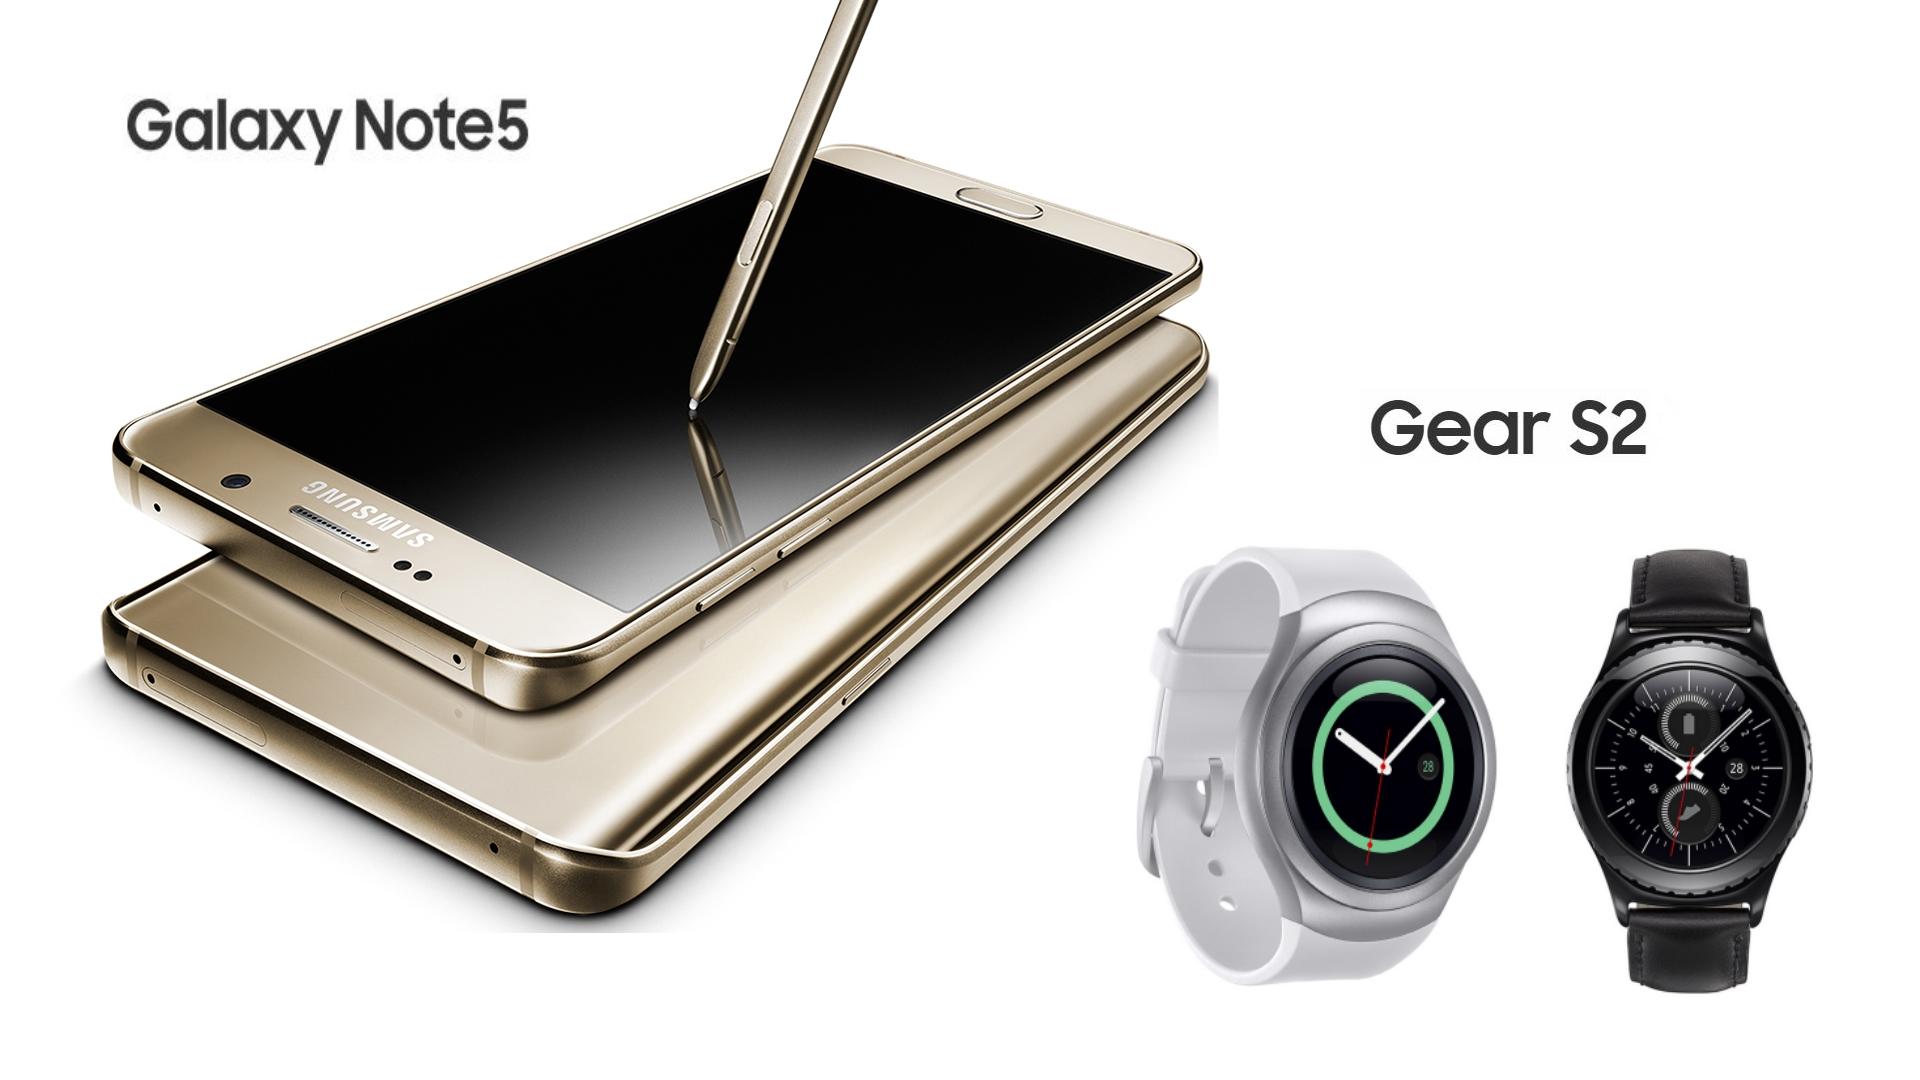 Samsung apresenta Galaxy Note 5 e Gear S2